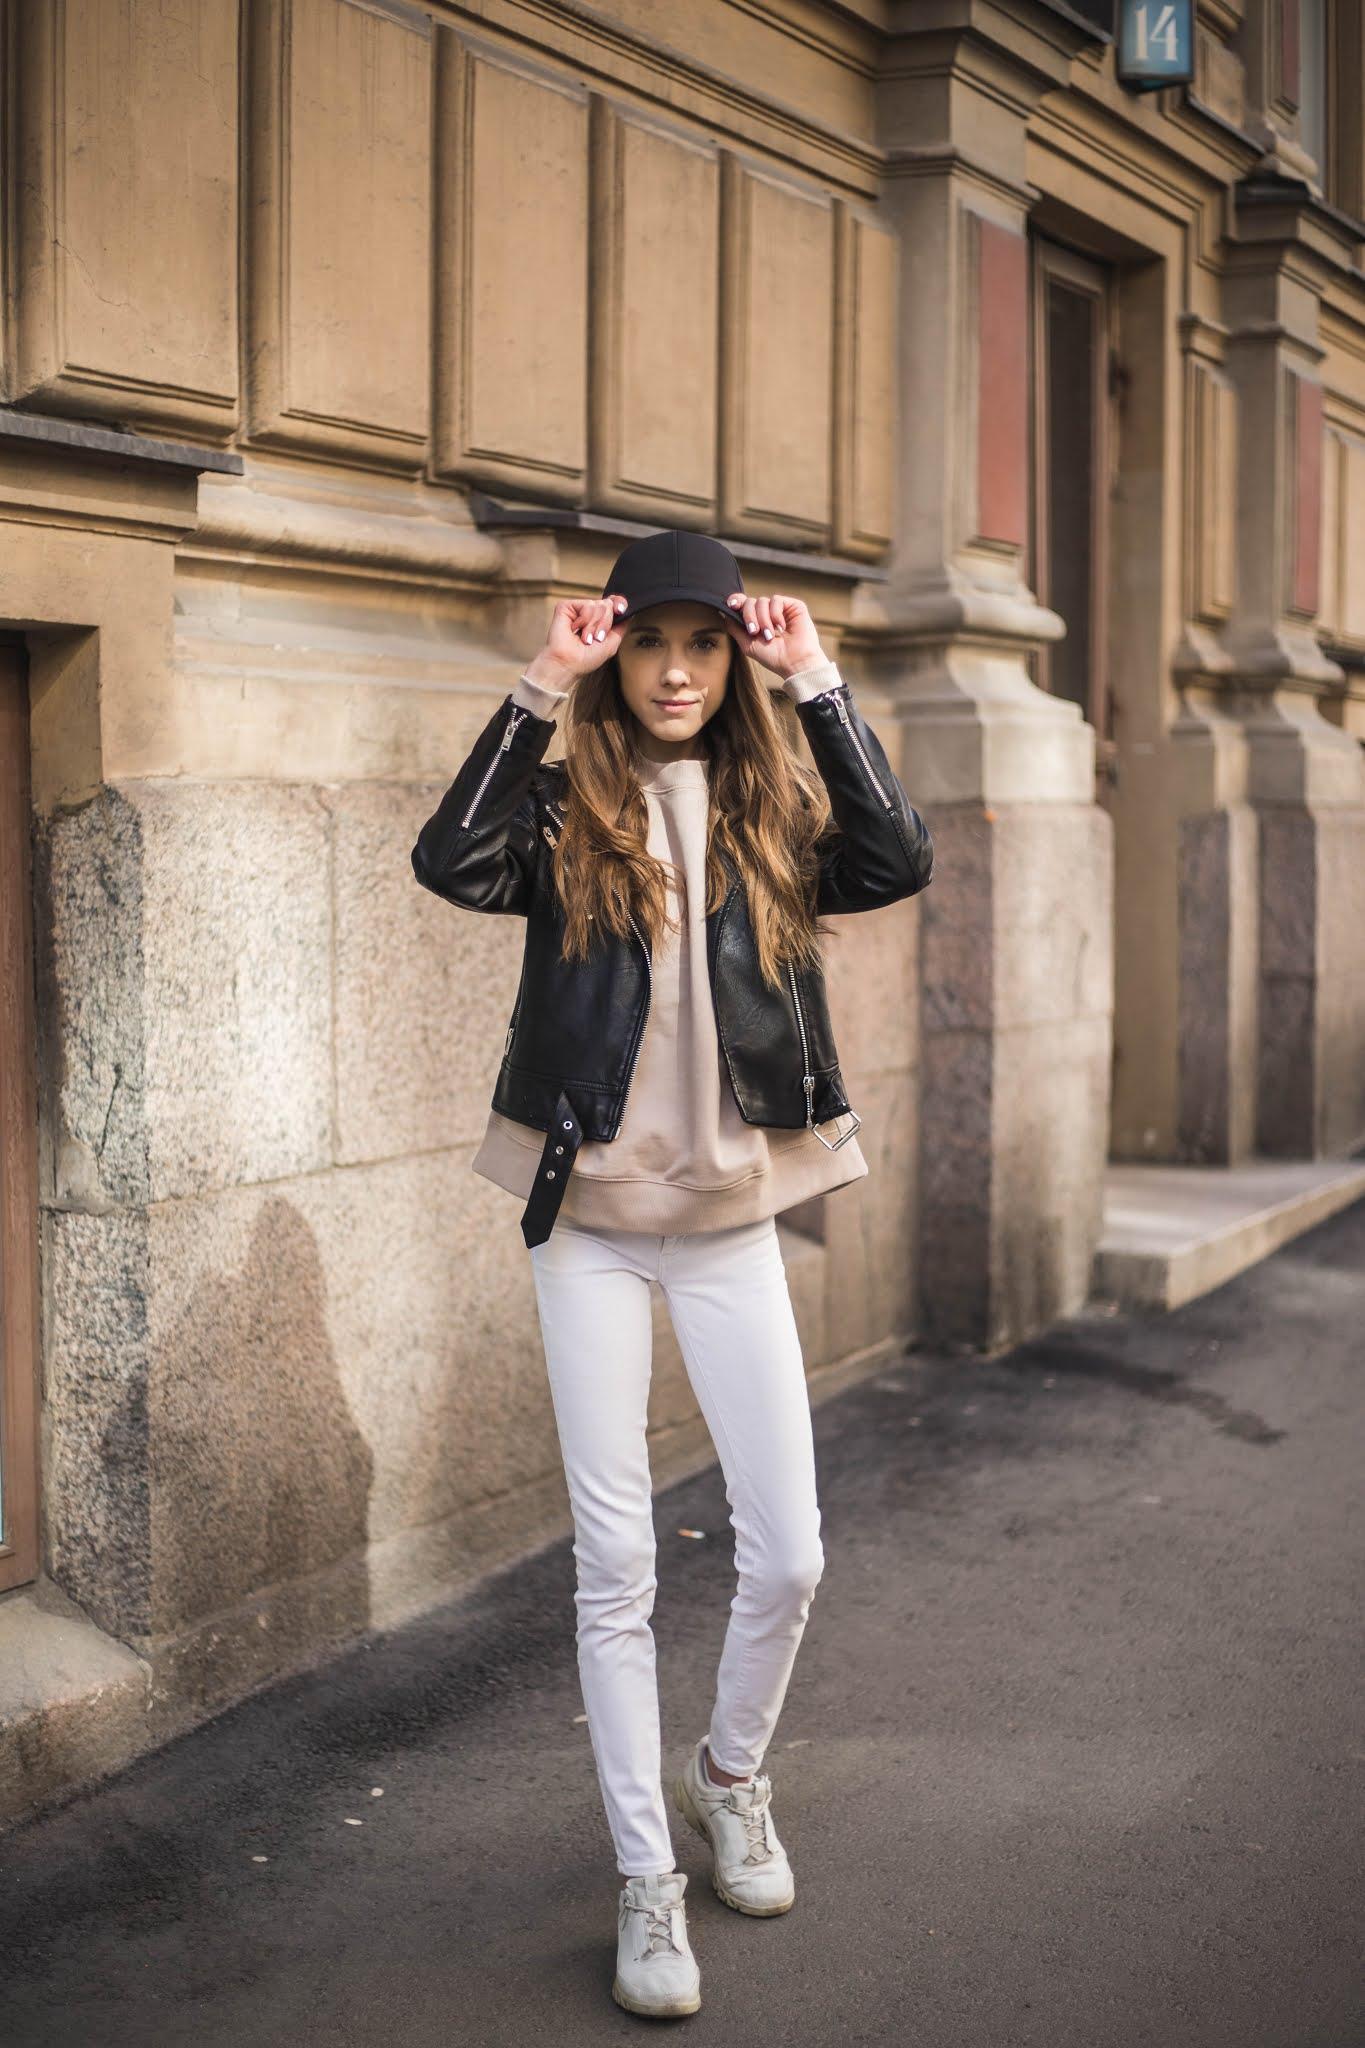 Asuinspiraatio lippiksen kanssa // Outfit inspiration with a cap